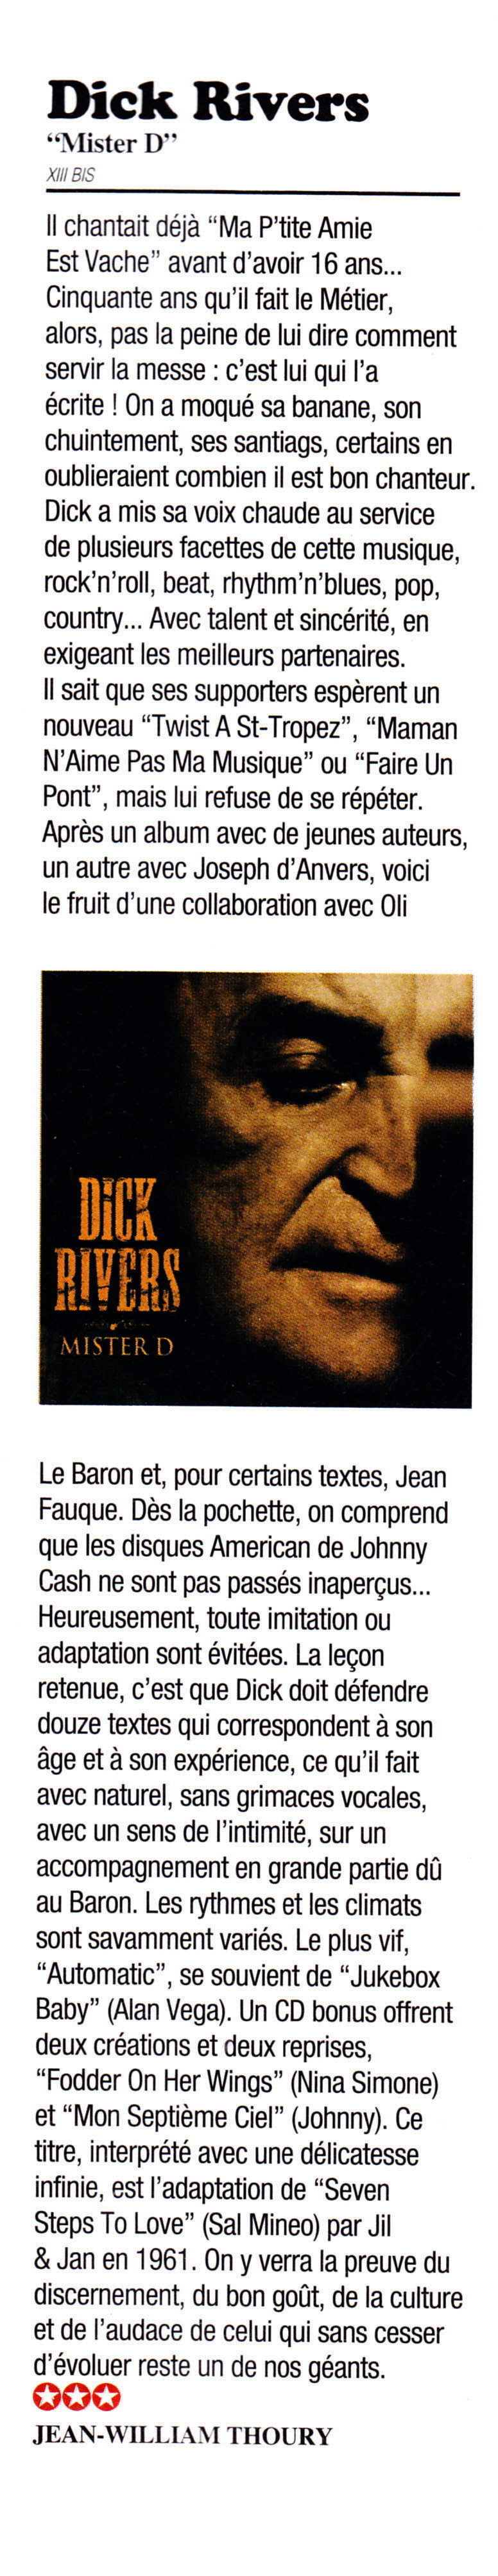 "DICK RIVERS ""Mister D Tour"" 2011/2013 : compte rendu (Casino de Paris, Olympia, Noisy, Clamart) 13082303164615789311487555"